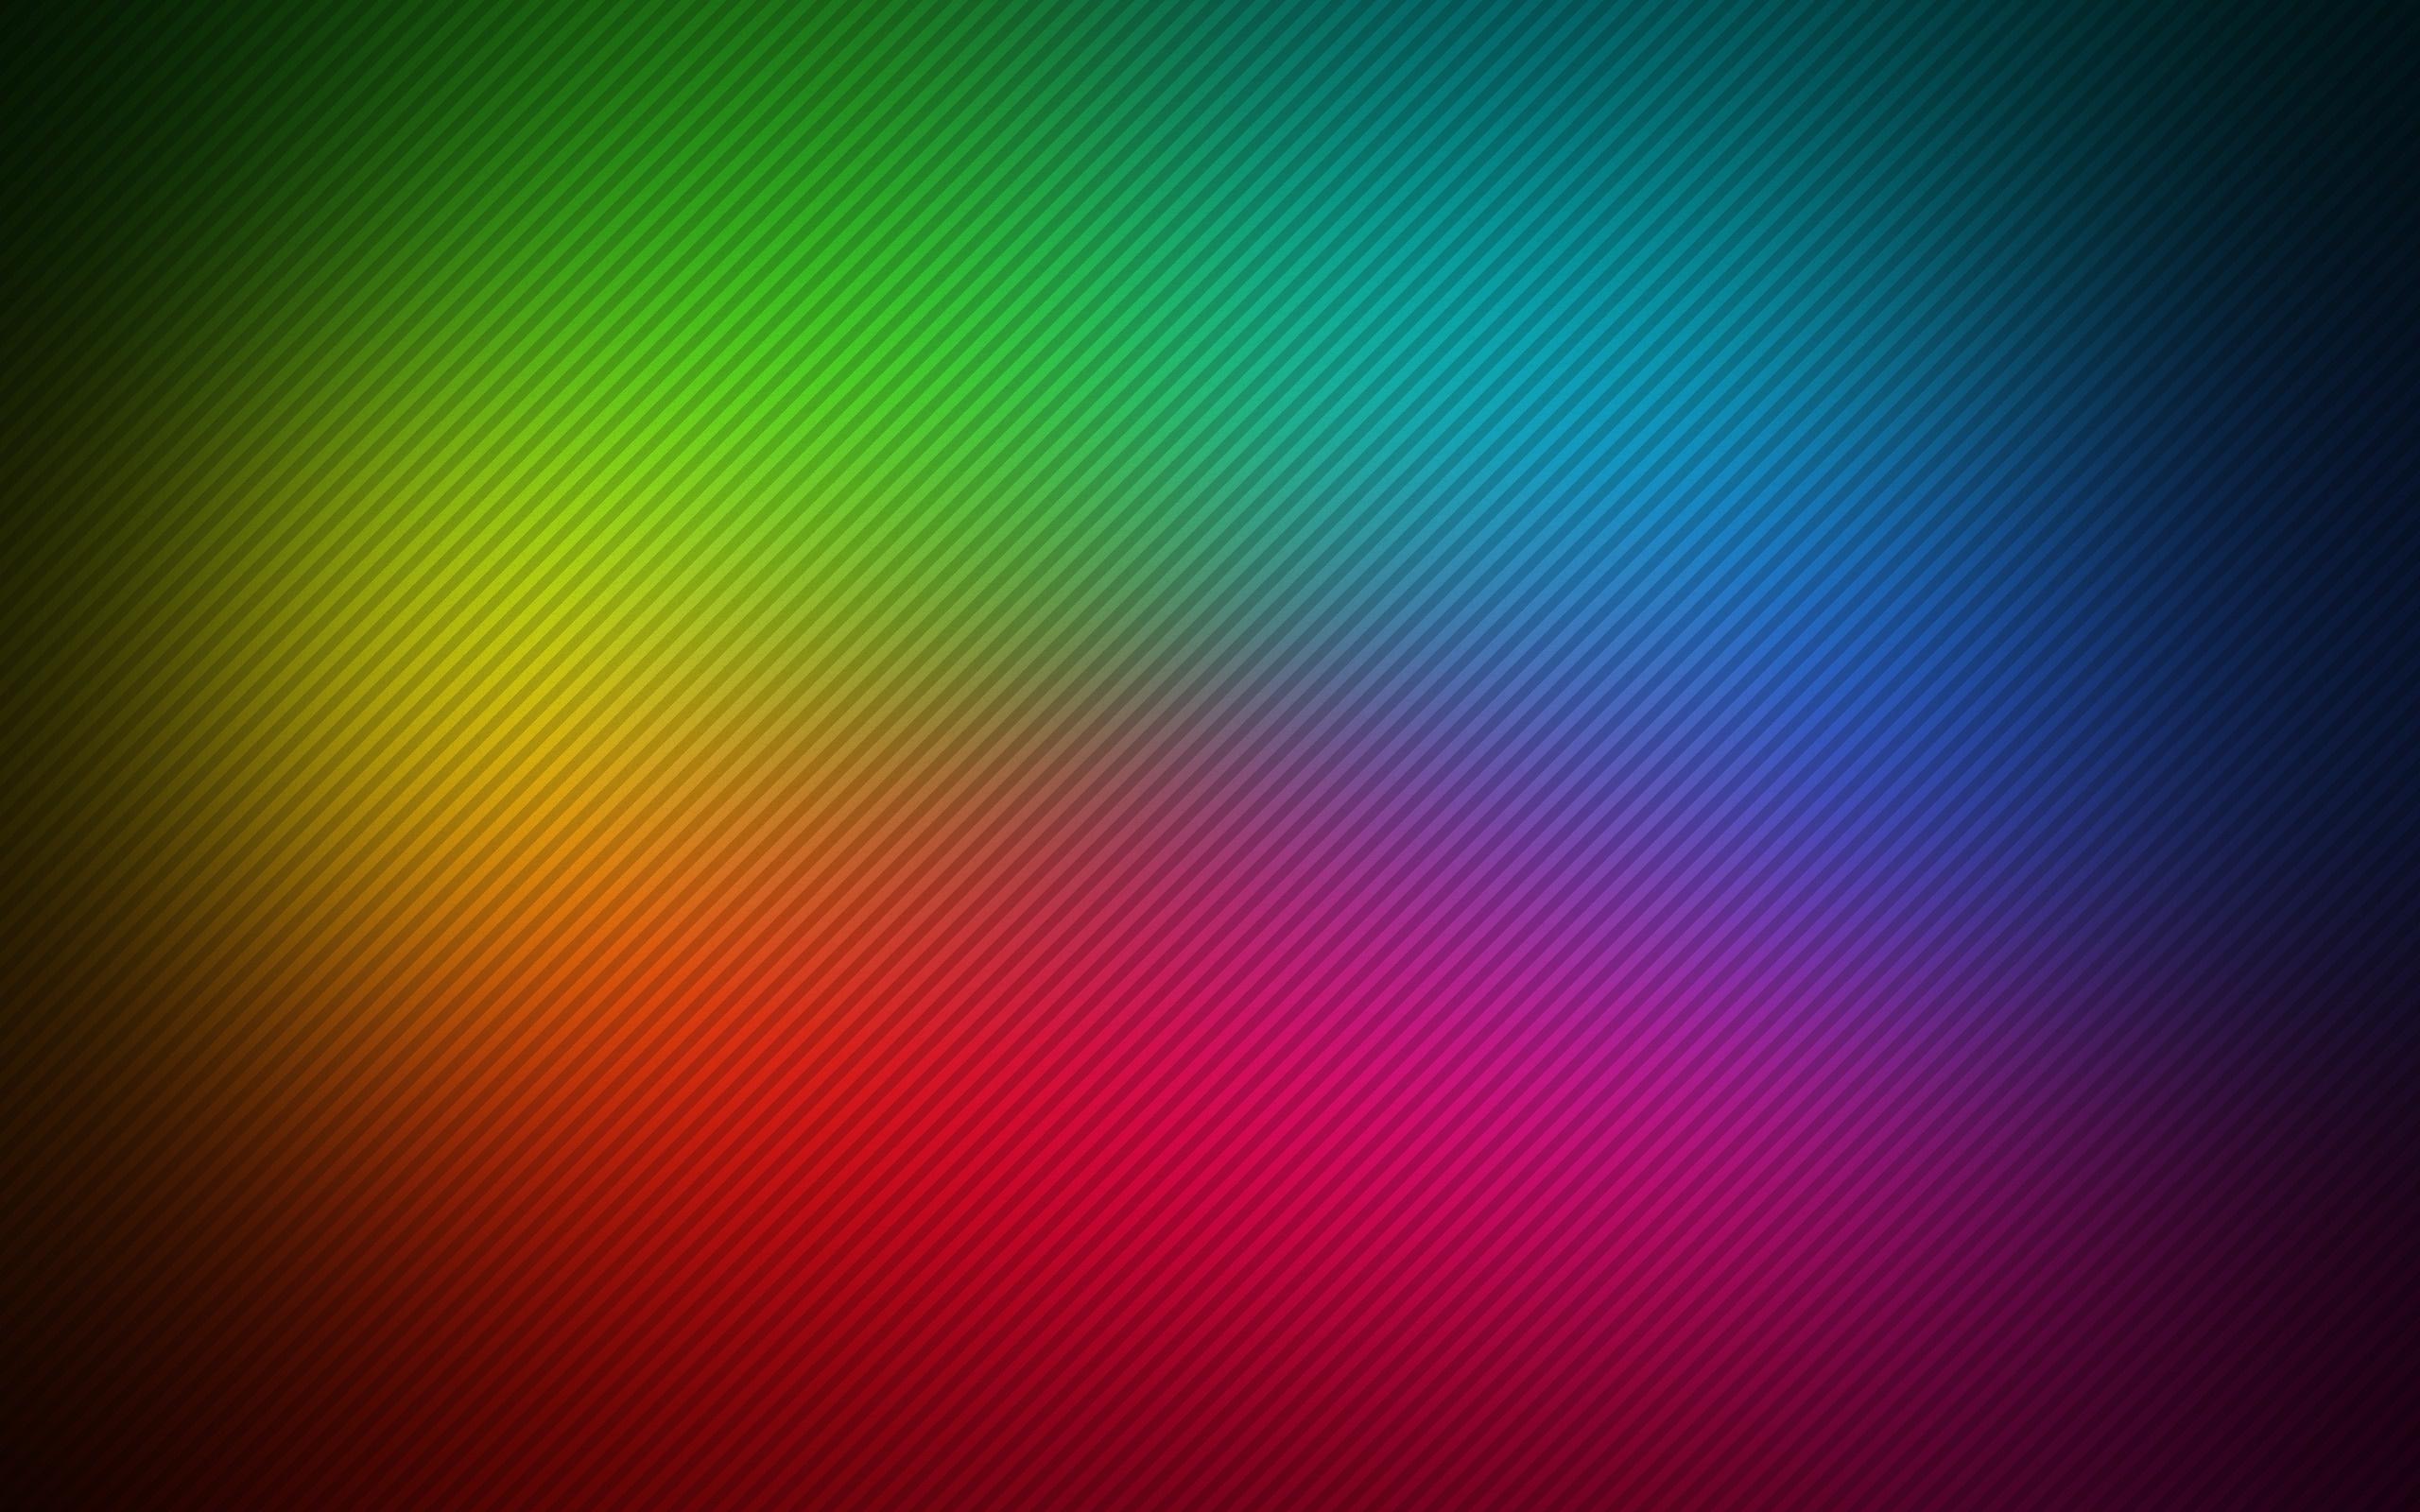 Colored Backgrounds - WallpaperSafari